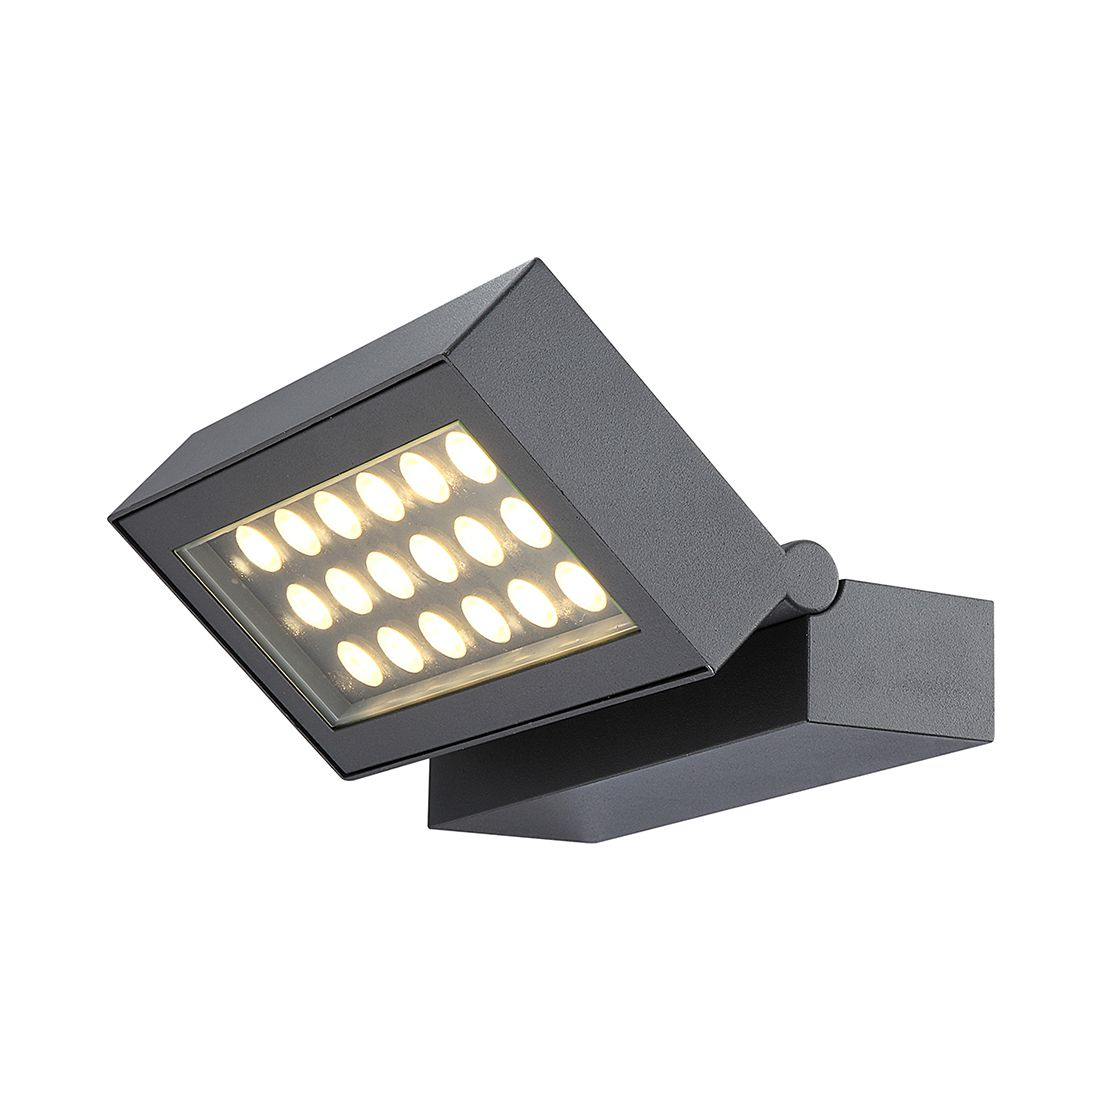 LED-Außenleuchte Tasilla by Globo ● Aluminium/Glas ● Grau- Globo Lighting A+